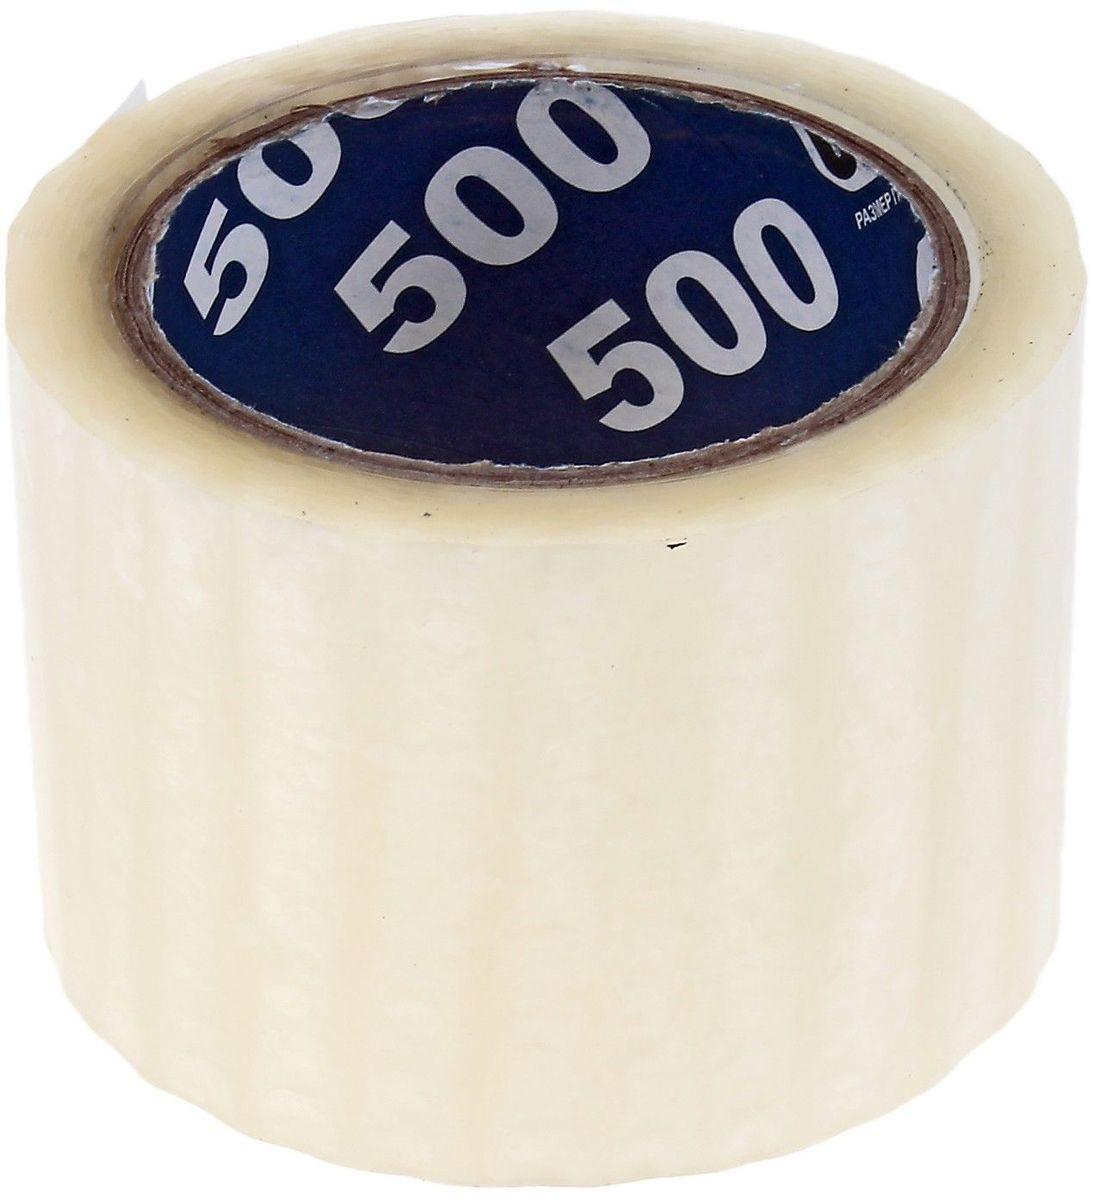 Unibob Клейкая лента 72 мм х 66 м цвет прозрачный 691930